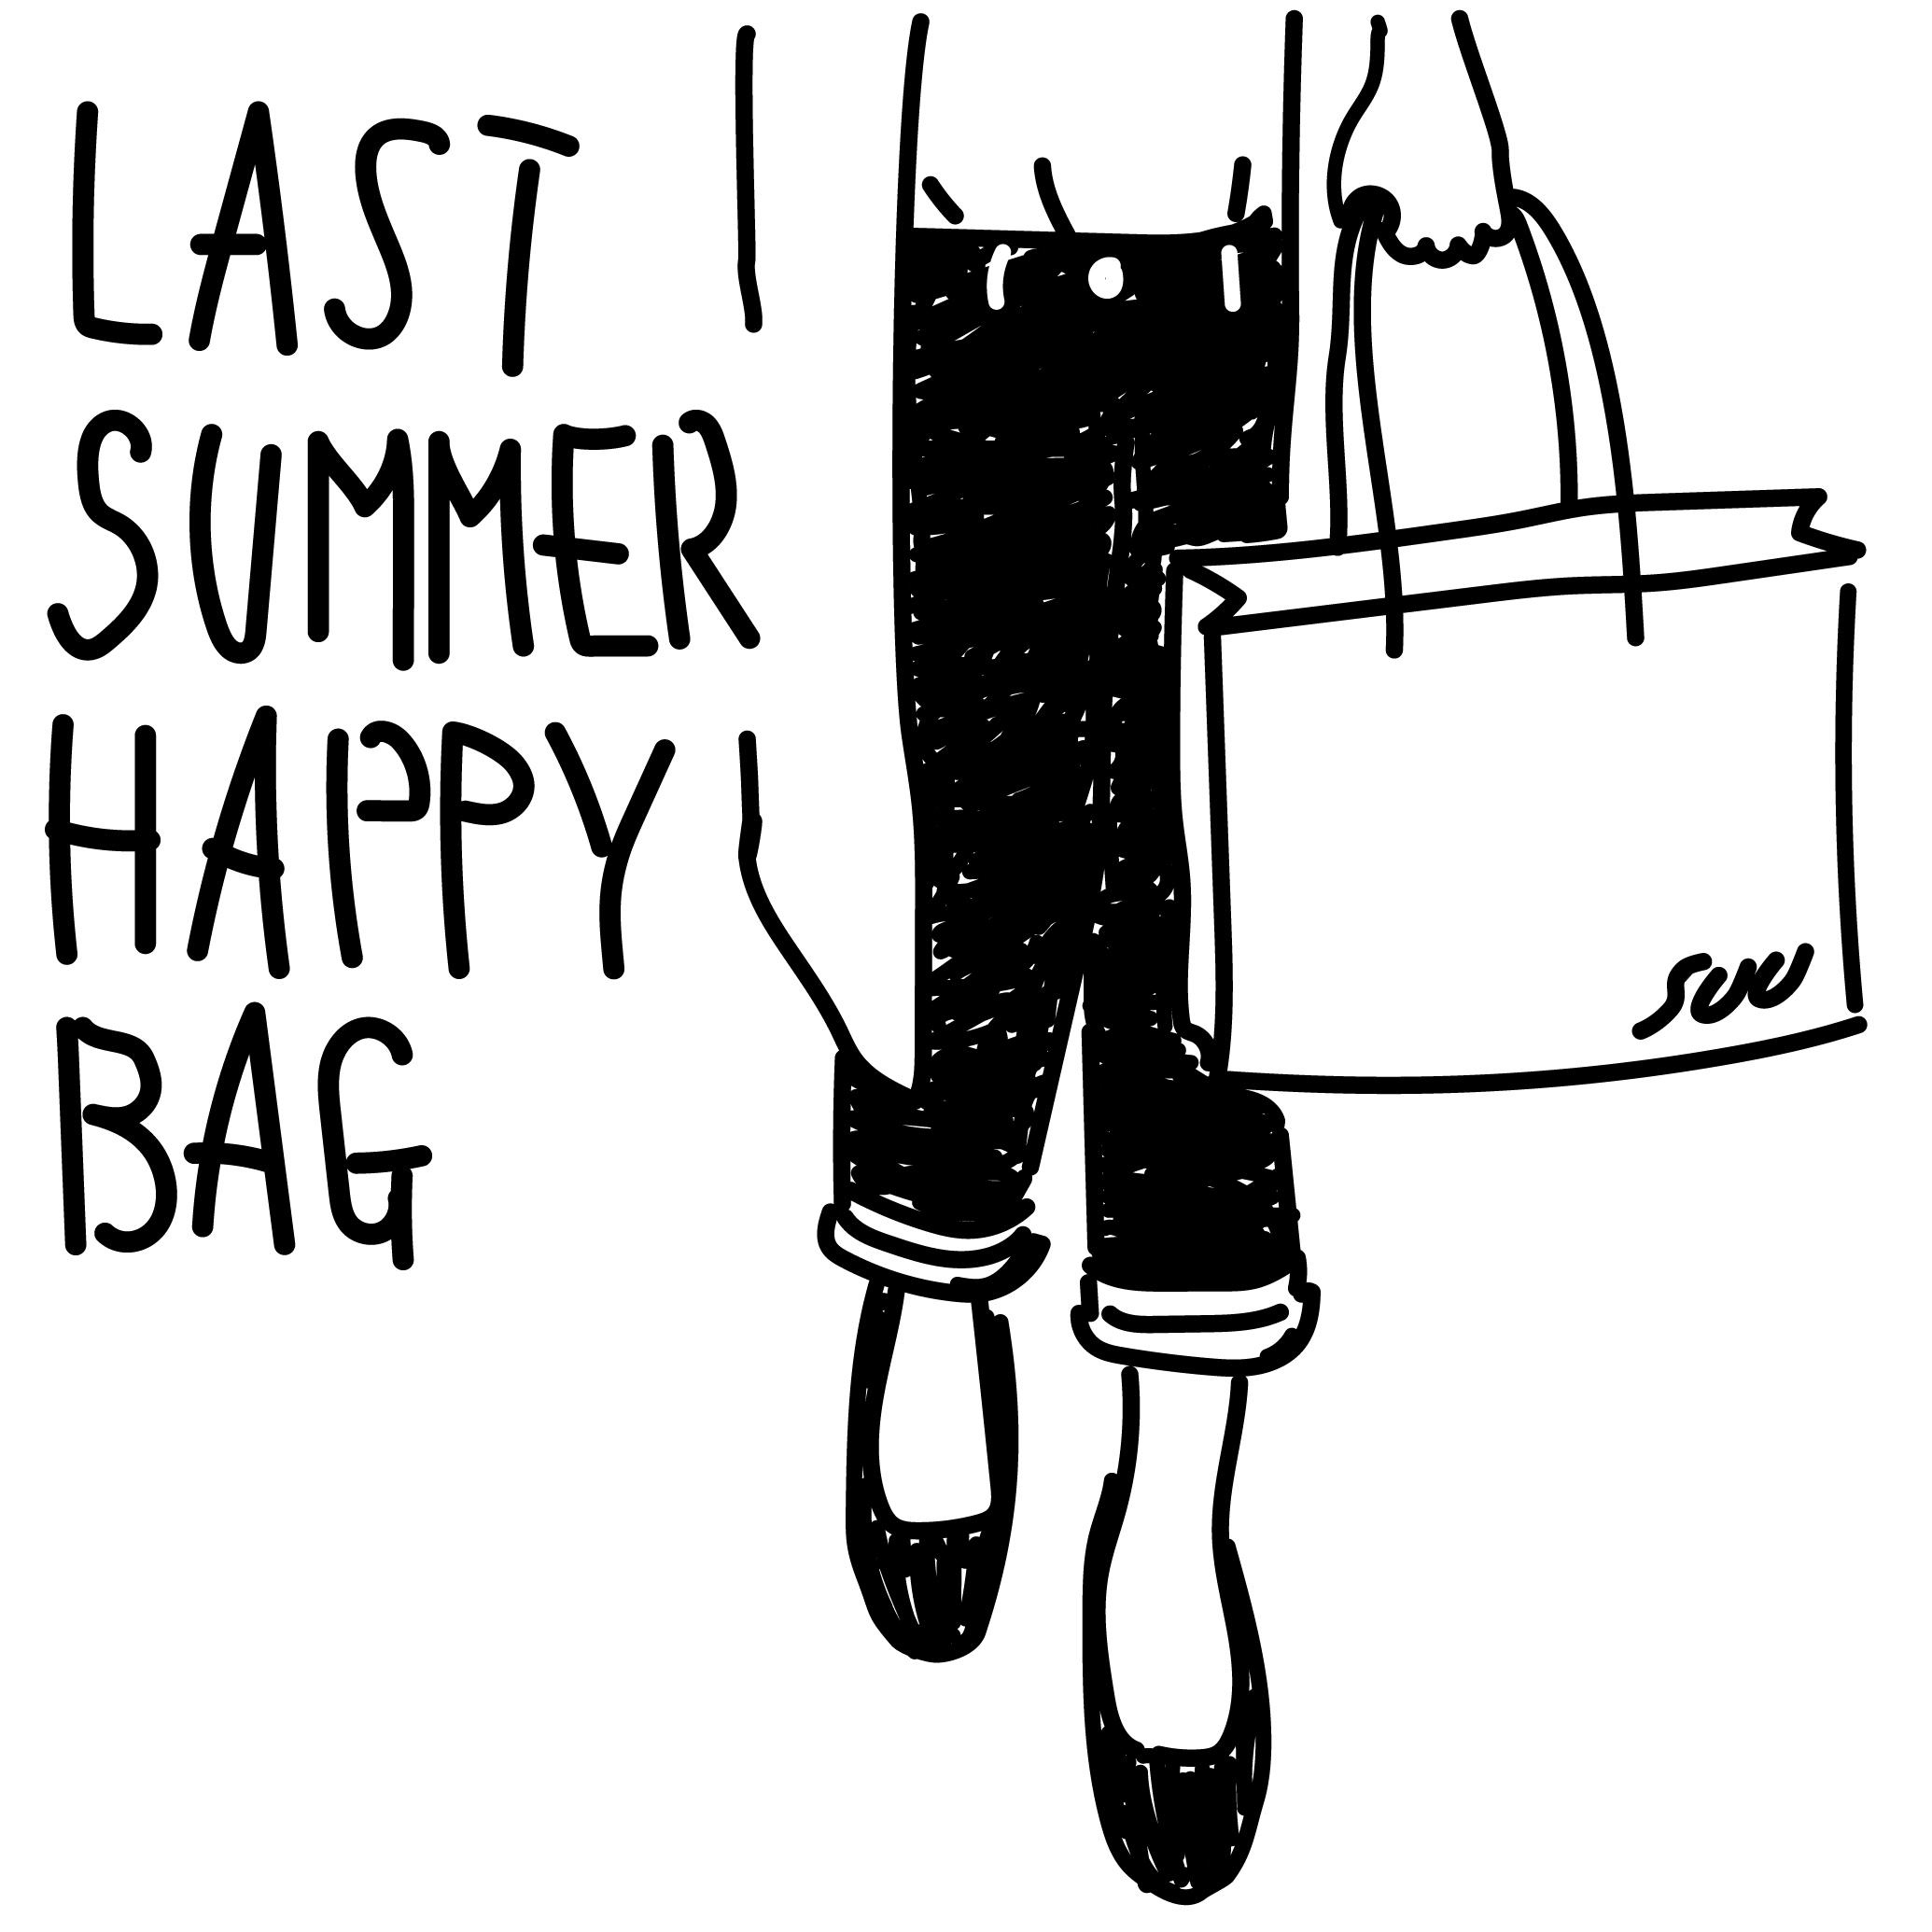 SUU 2021 LAST SUMMER HAPPY BAG : Cセット